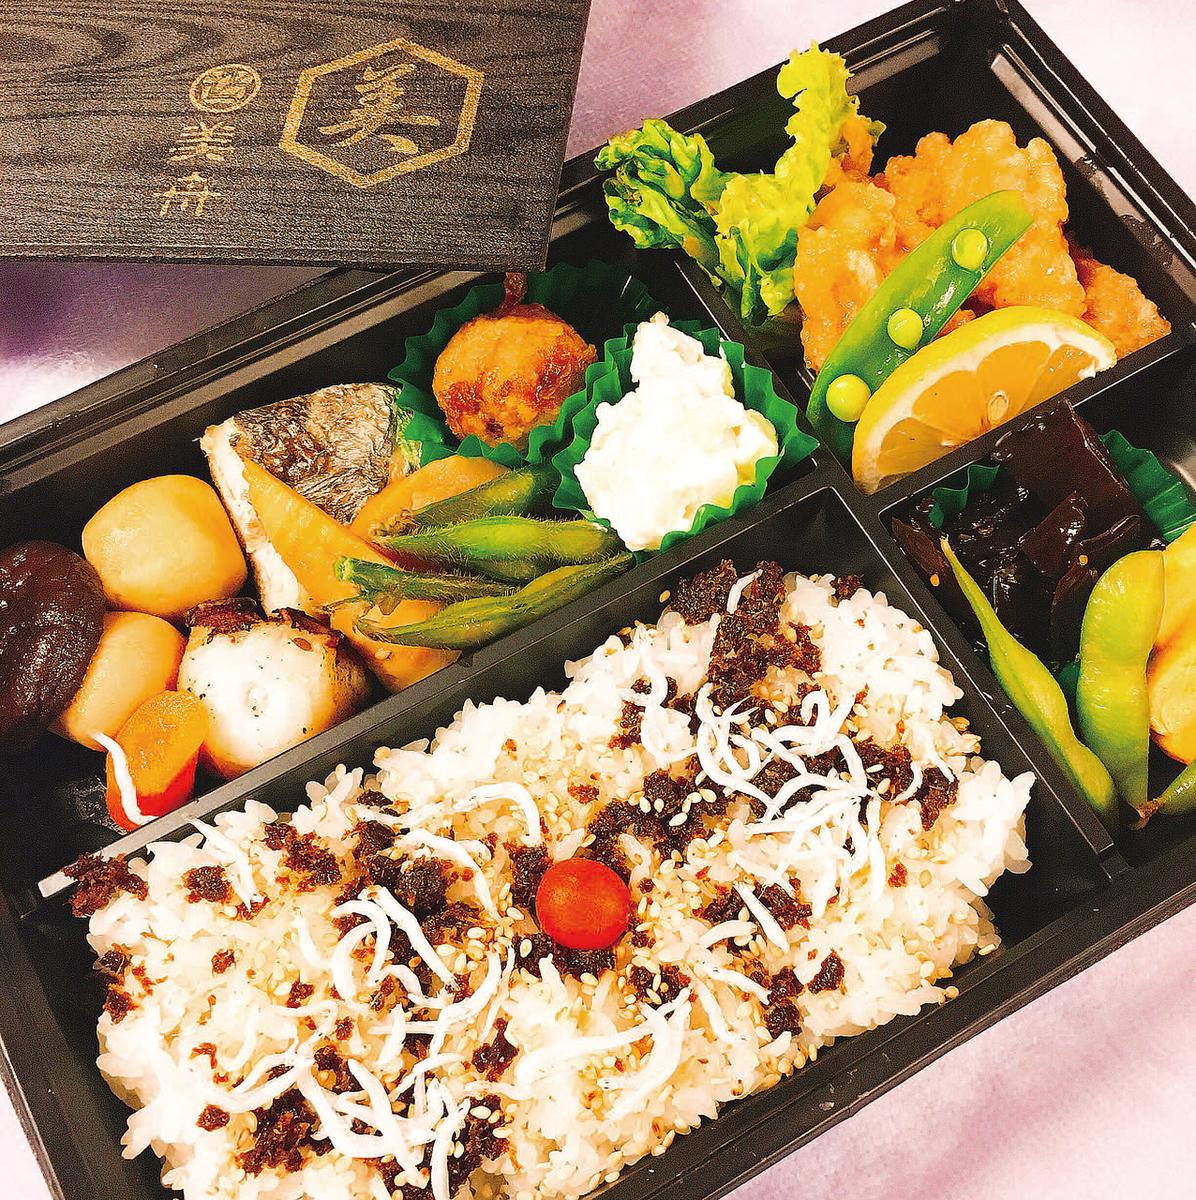 Take-away lunch box